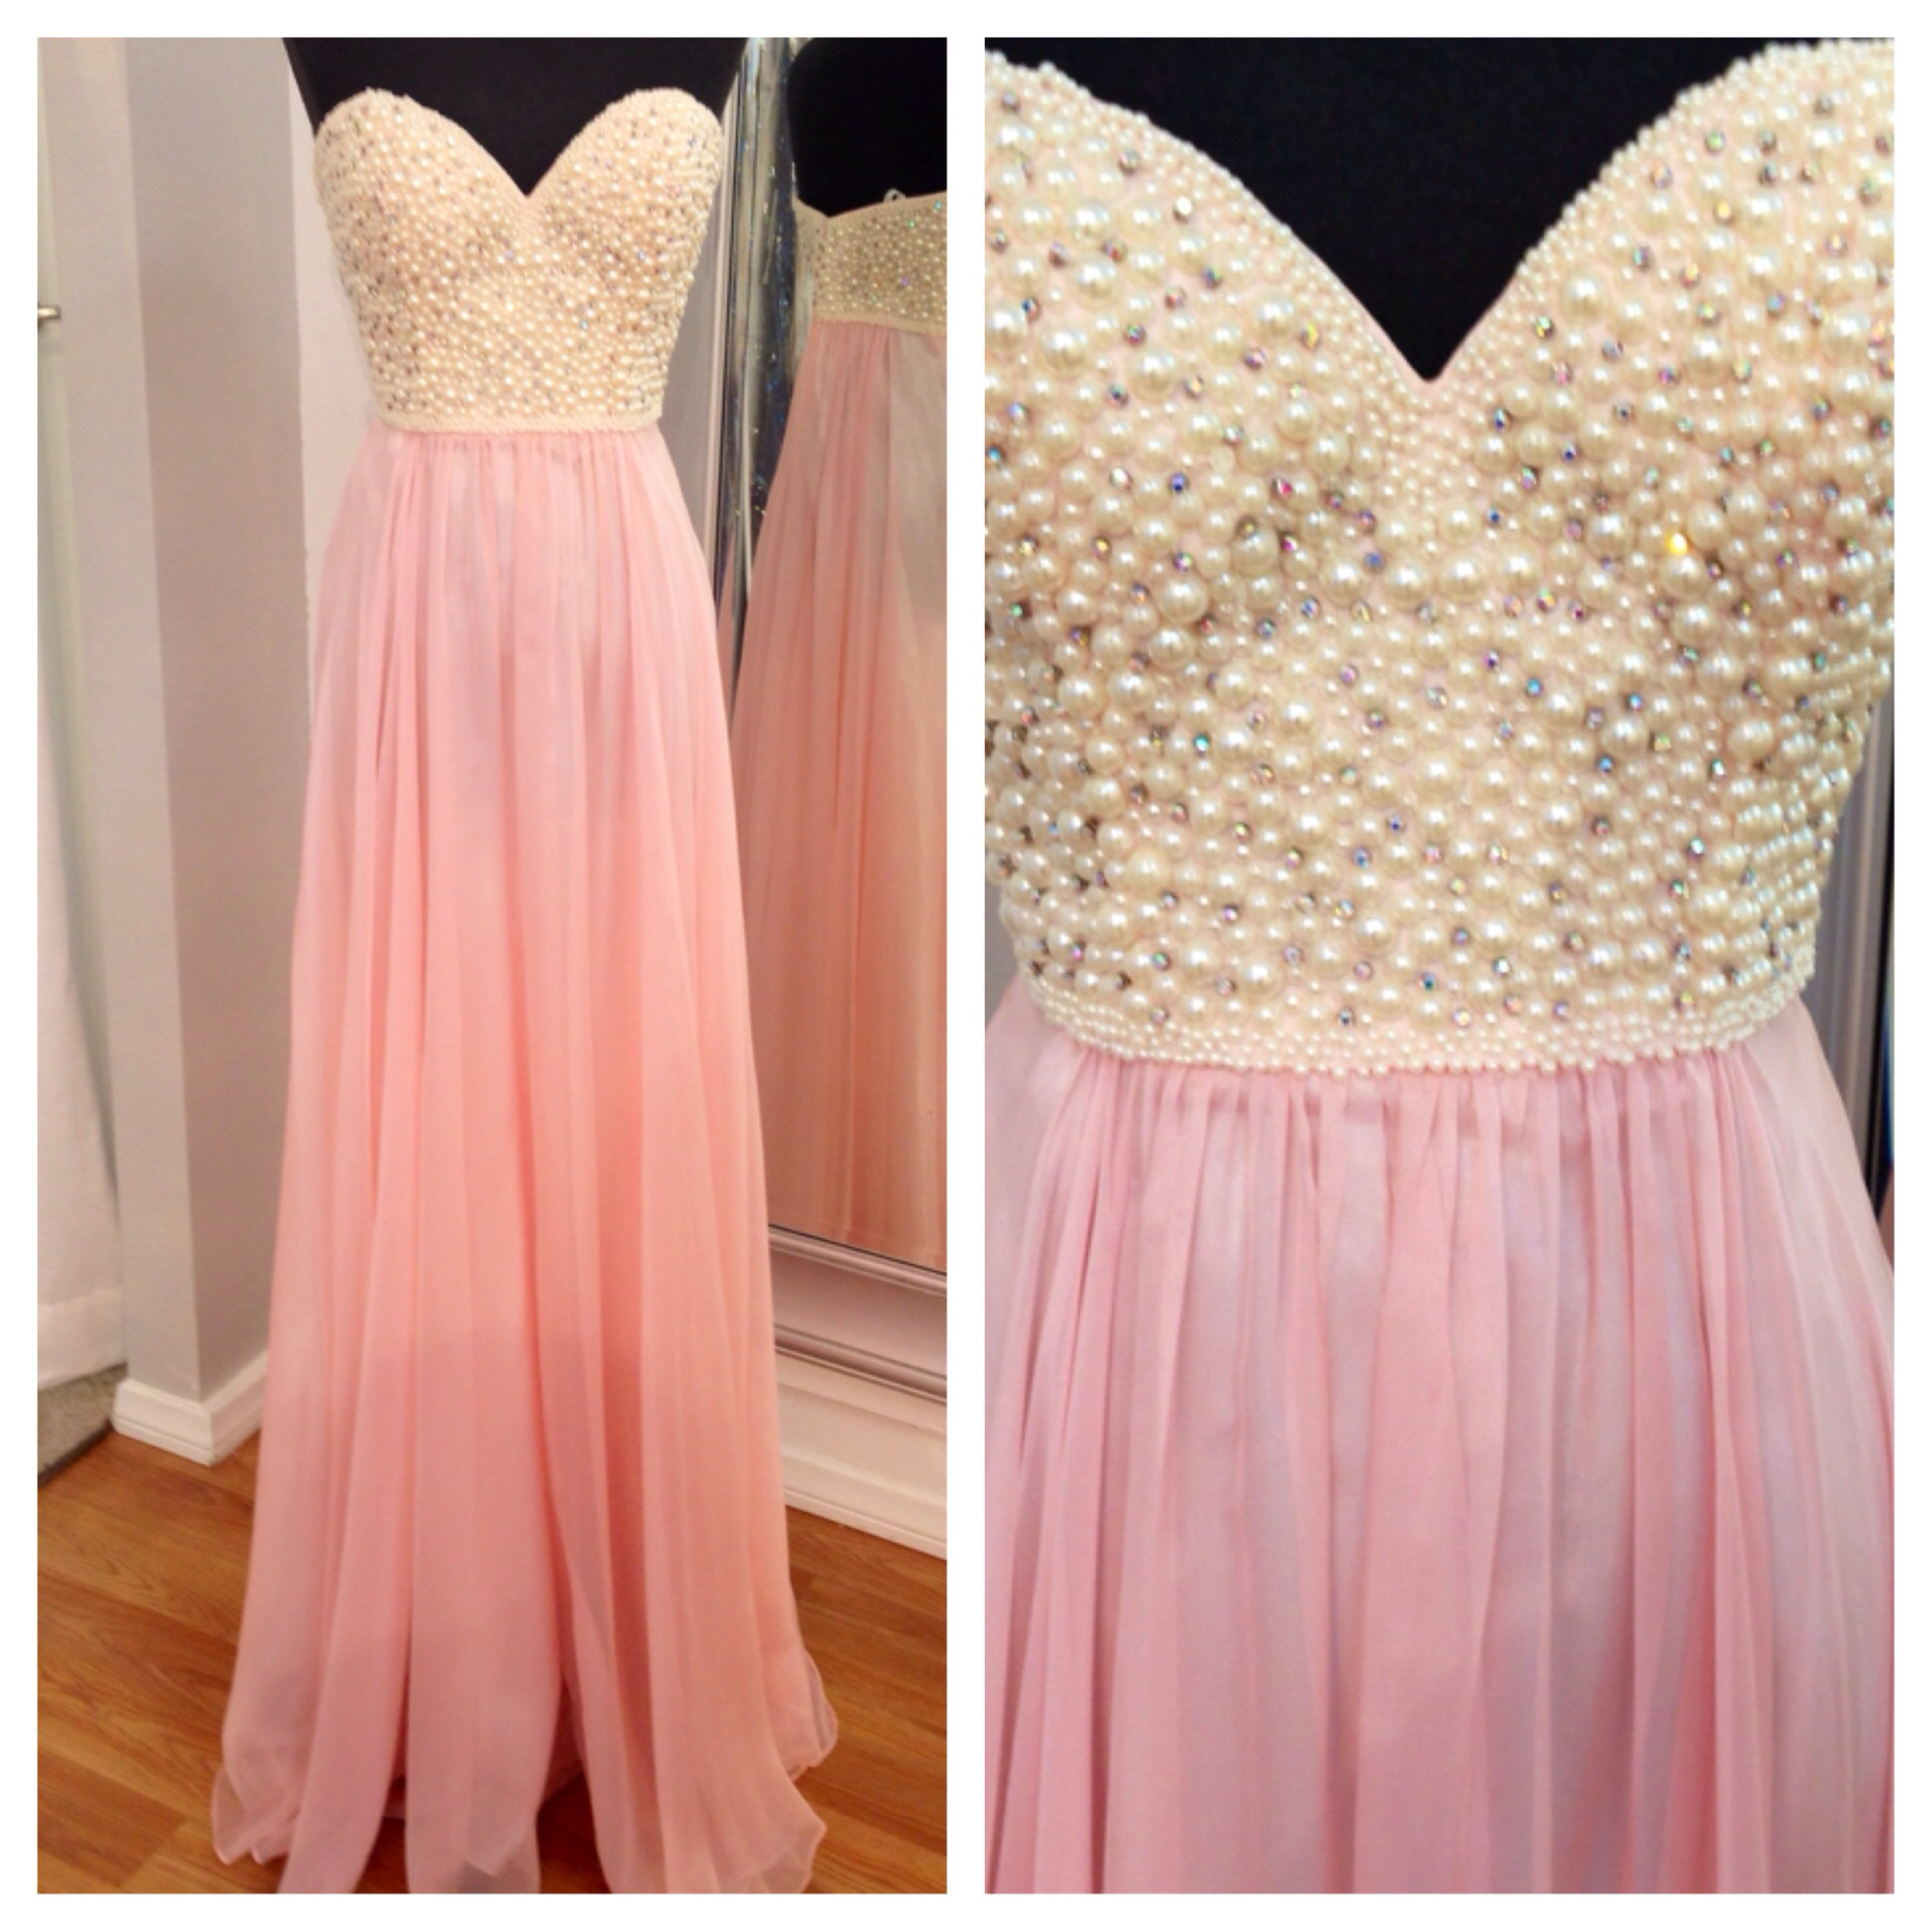 THIS WILL BE MY PROM DRESS! | Cosas para ponerme | Pinterest ...